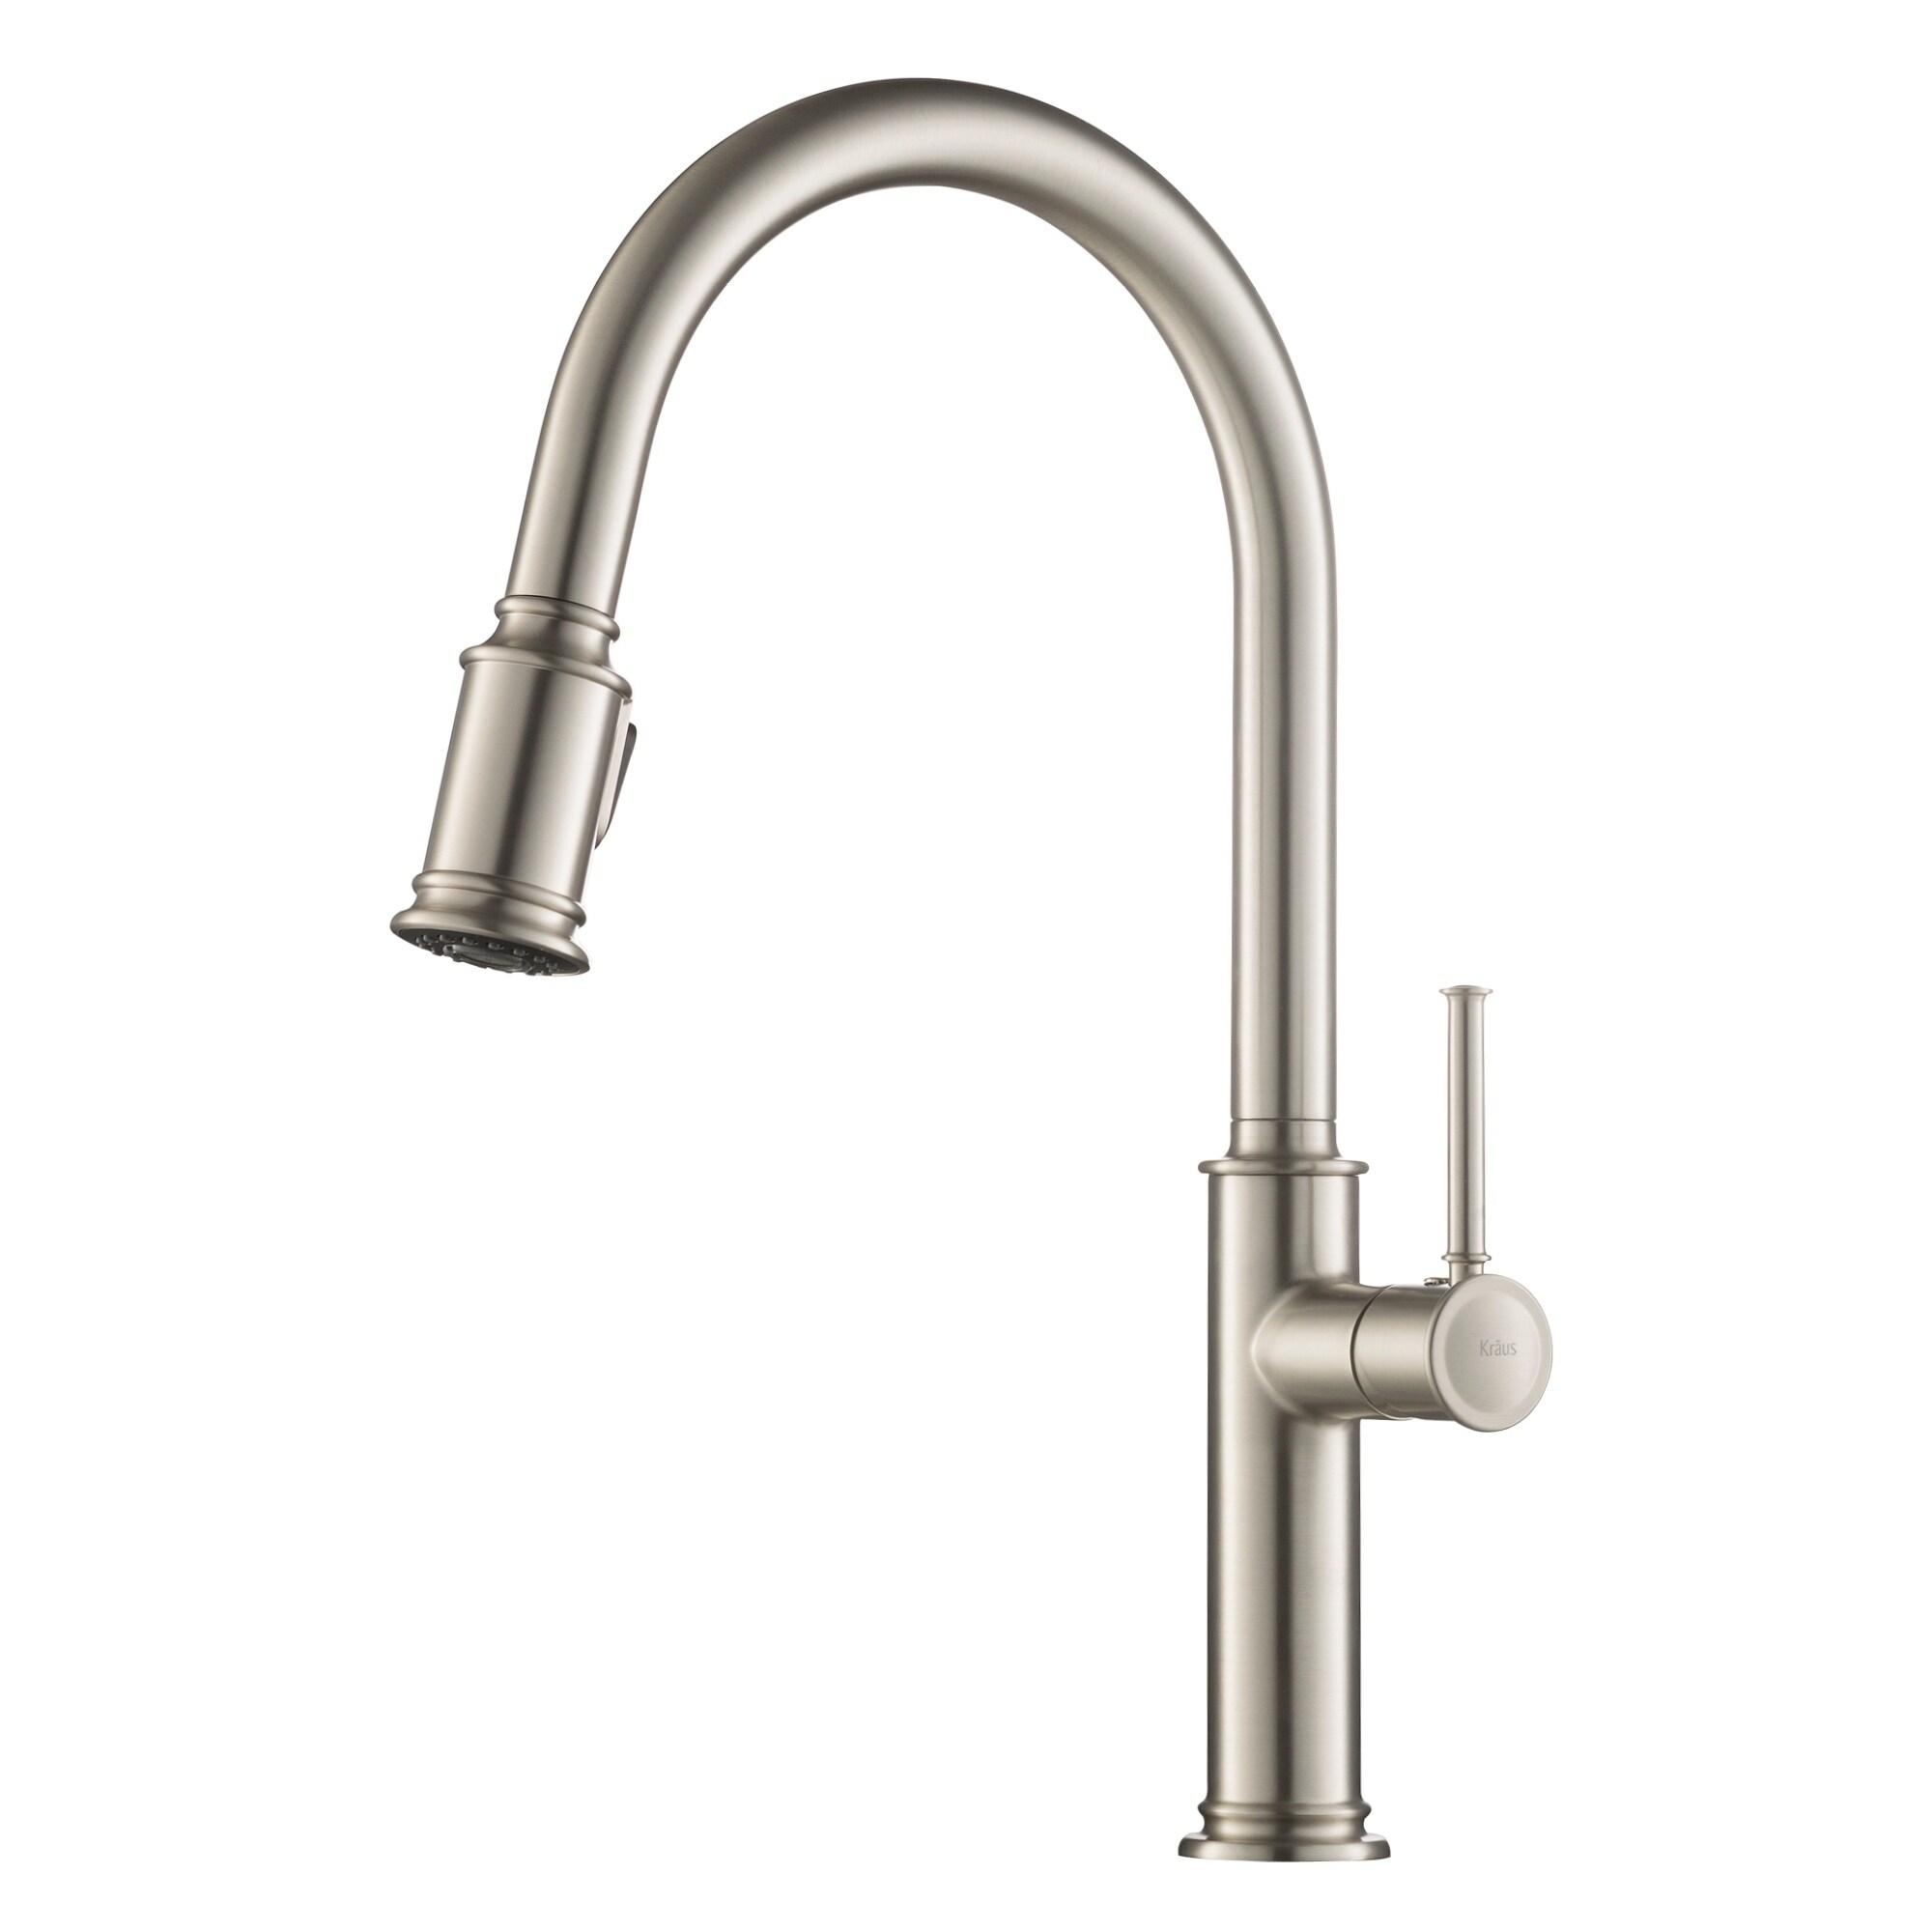 Superbe Kraus KPF 1680 Sellette 1 Handle 2 Function Sprayhead Pull Down Kitchen  Faucet